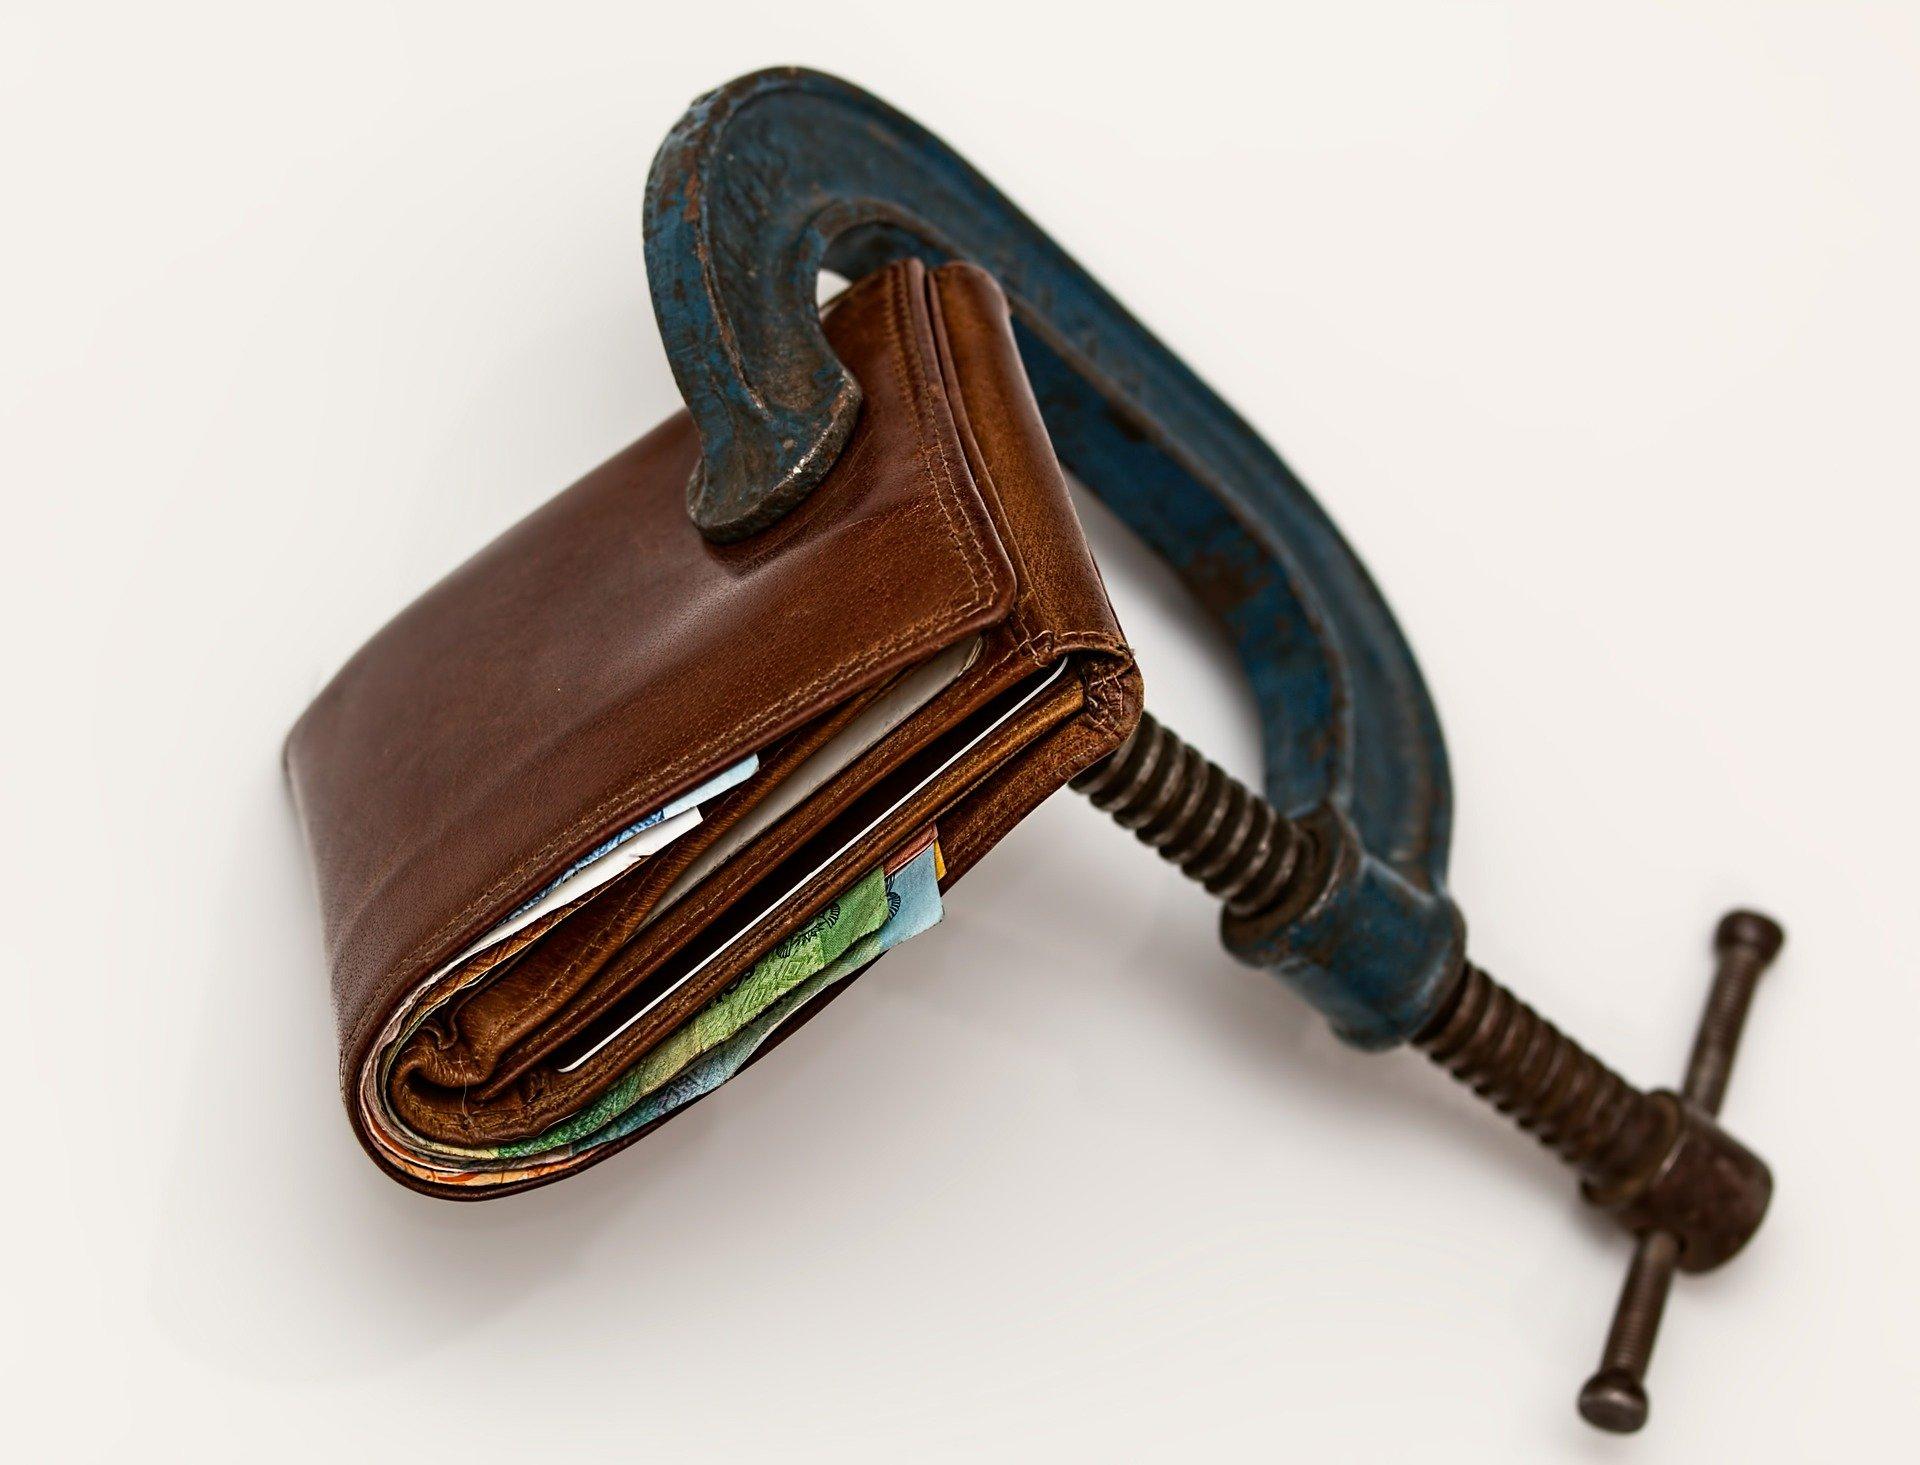 Securing Deposit Return as a Student